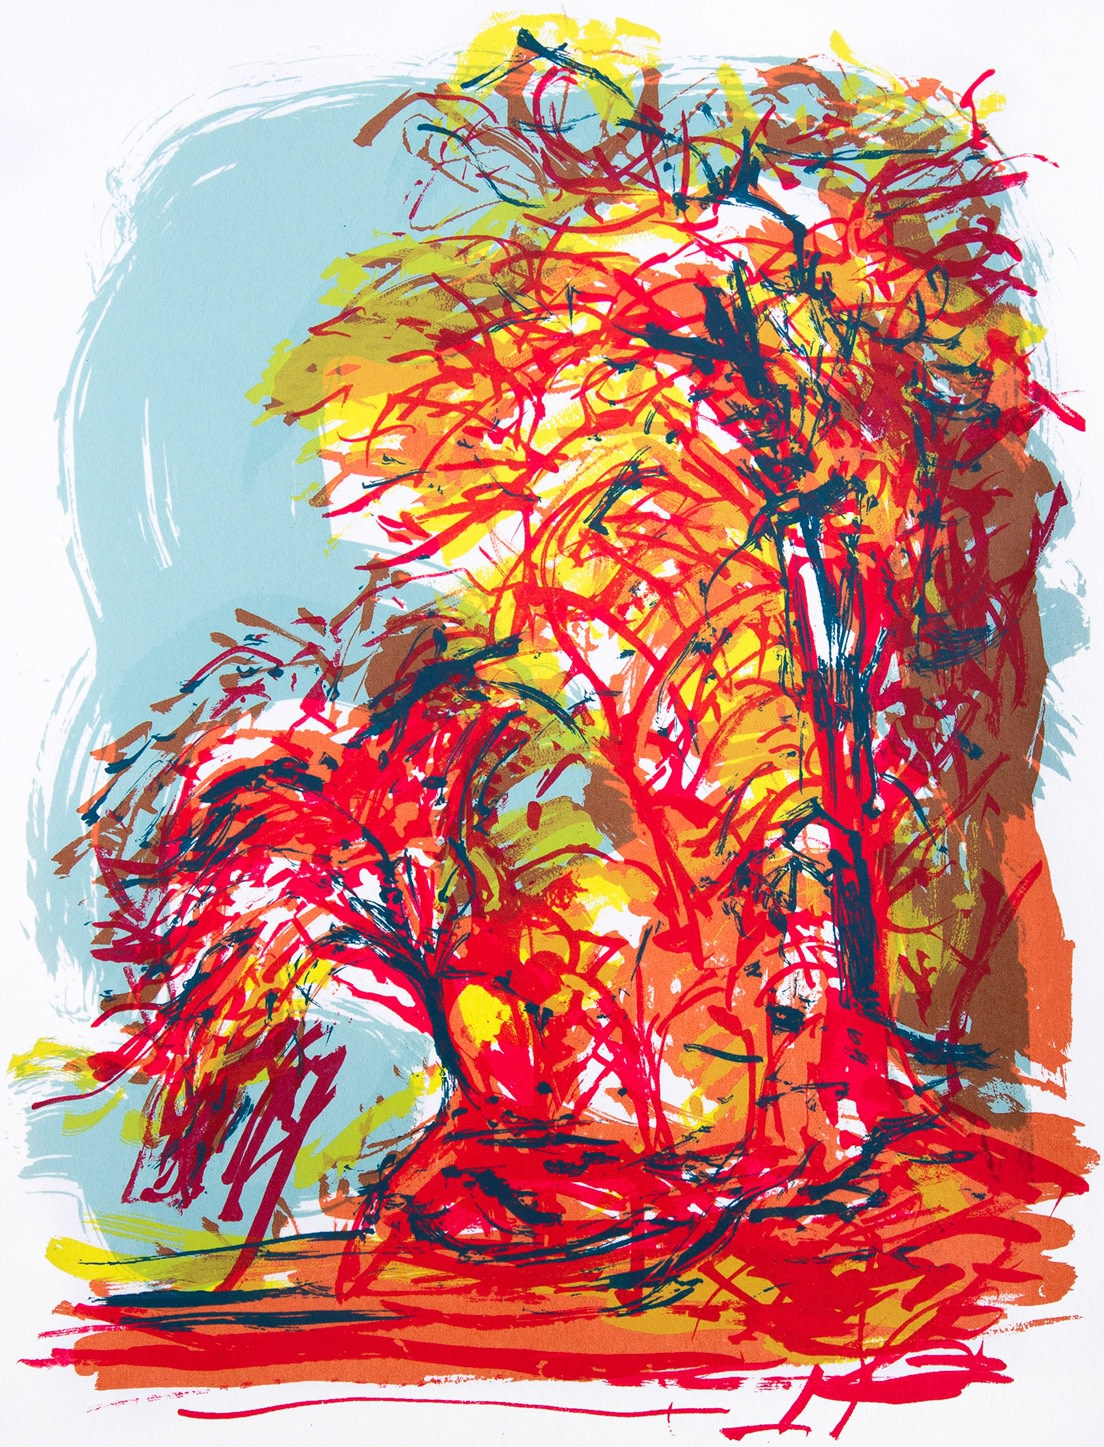 "<span class=""link fancybox-details-link""><a href=""/artists/321-denise-ballard-wyllie-are/works/11524/"">View Detail Page</a></span><div class=""artist""><span class=""artist""><strong>Denise Ballard Wyllie ARE</strong></span></div><div class=""title""><em>Cherry Blossom Front: The Effervescences of Summer</em></div><div class=""medium"">screenprint</div><div class=""dimensions"">50 x 42 cm framed<br /> 29 x 21 cm image size</div><div class=""edition_details"">edition of 20</div><div class=""price"">£460.00 framed<br>£367.00 unframed</div>"